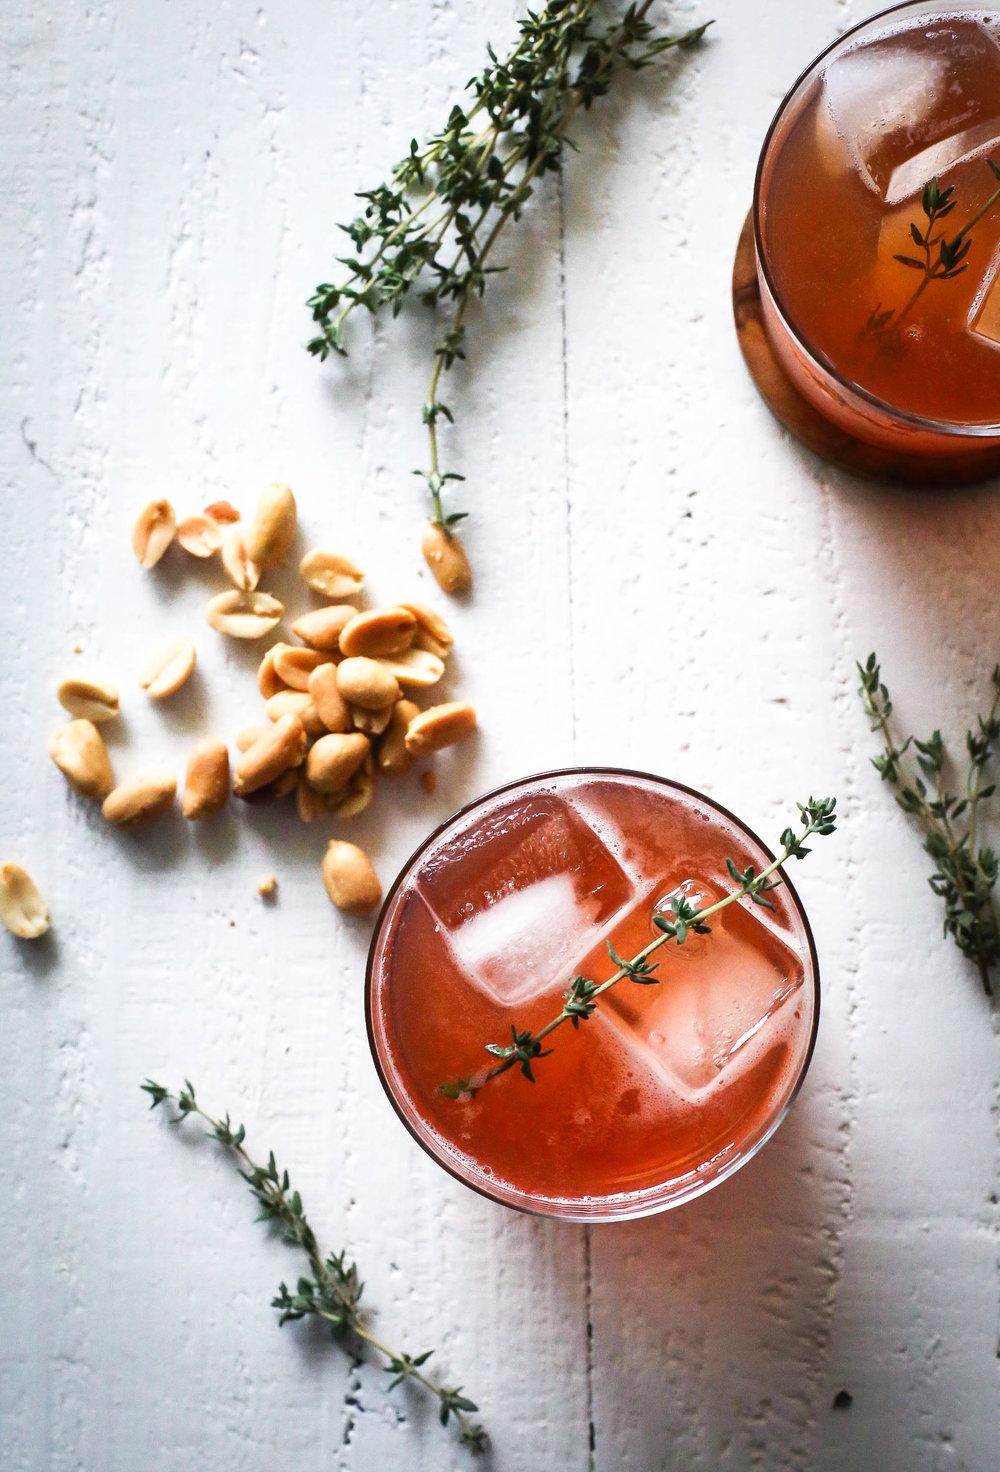 Raspberry Rhubarb Whisky Sour